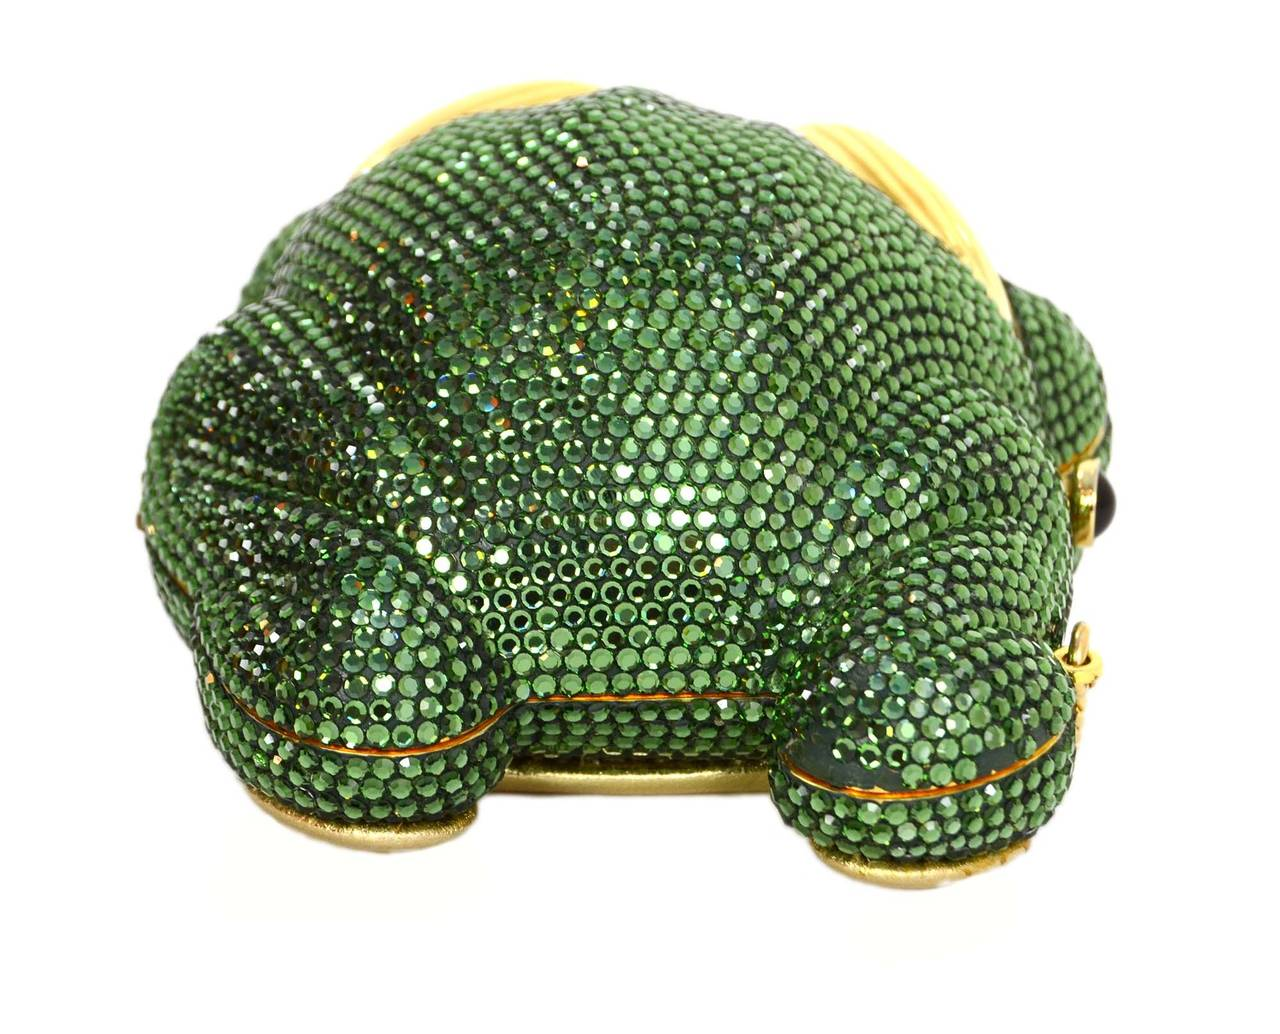 Judith Leiber Green Crystal Frog Minaudiere Bag GHW 3